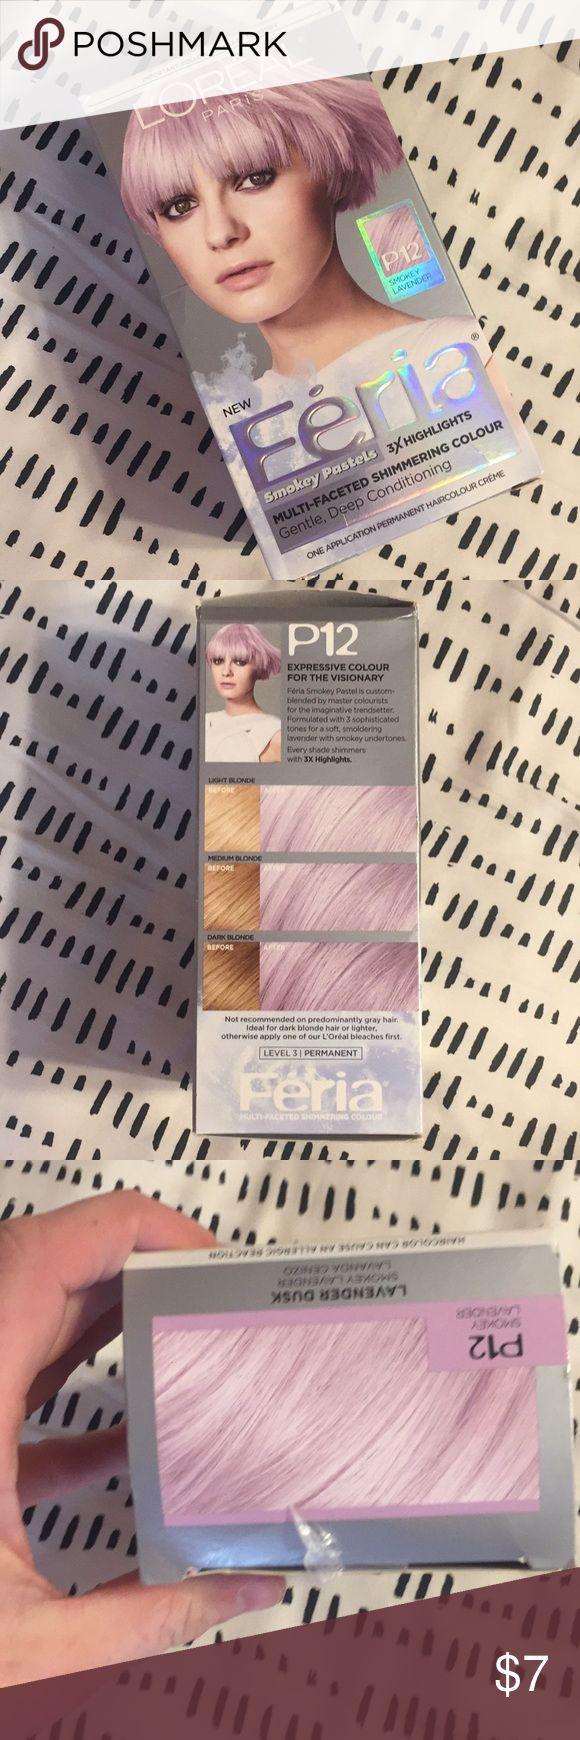 L Oreal Feria Smokey Lavender Haircolor Dye Brand New Unopened Box Of L O Modern Pastel Purple Hair Pastel Hair Lavender Hair